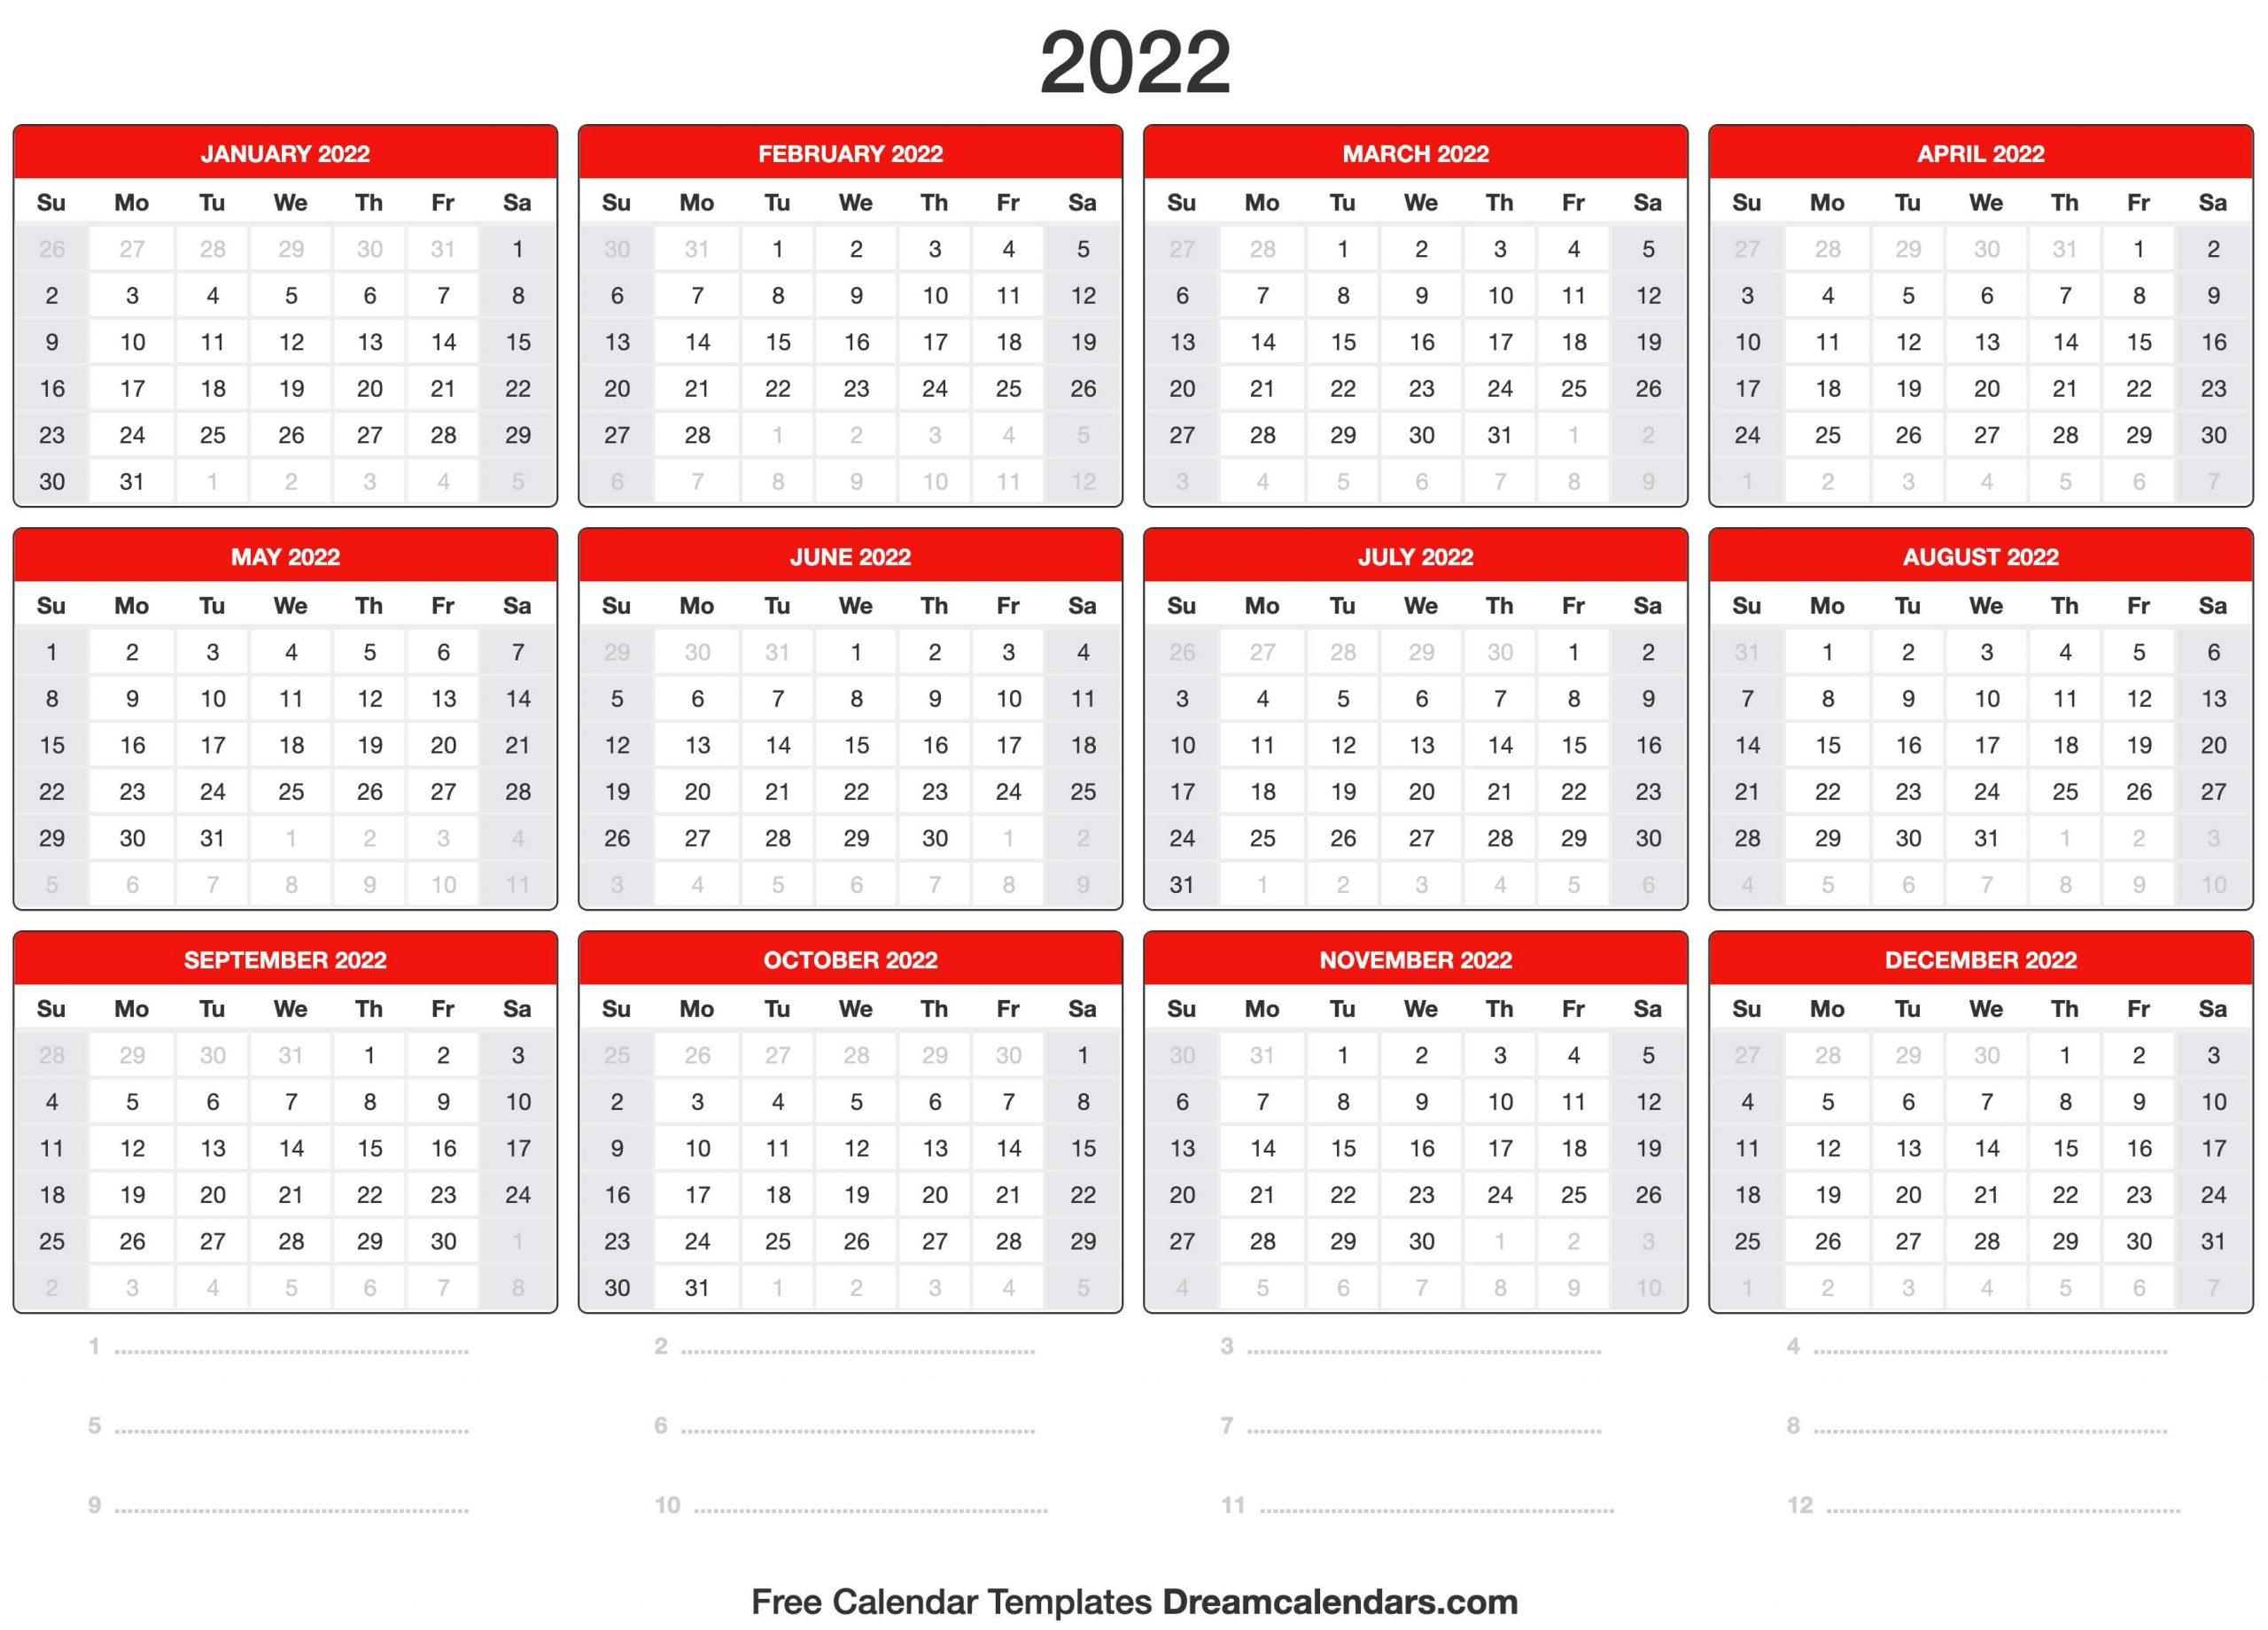 2022 Calendar With Free Printable Calendar Templates January 2022